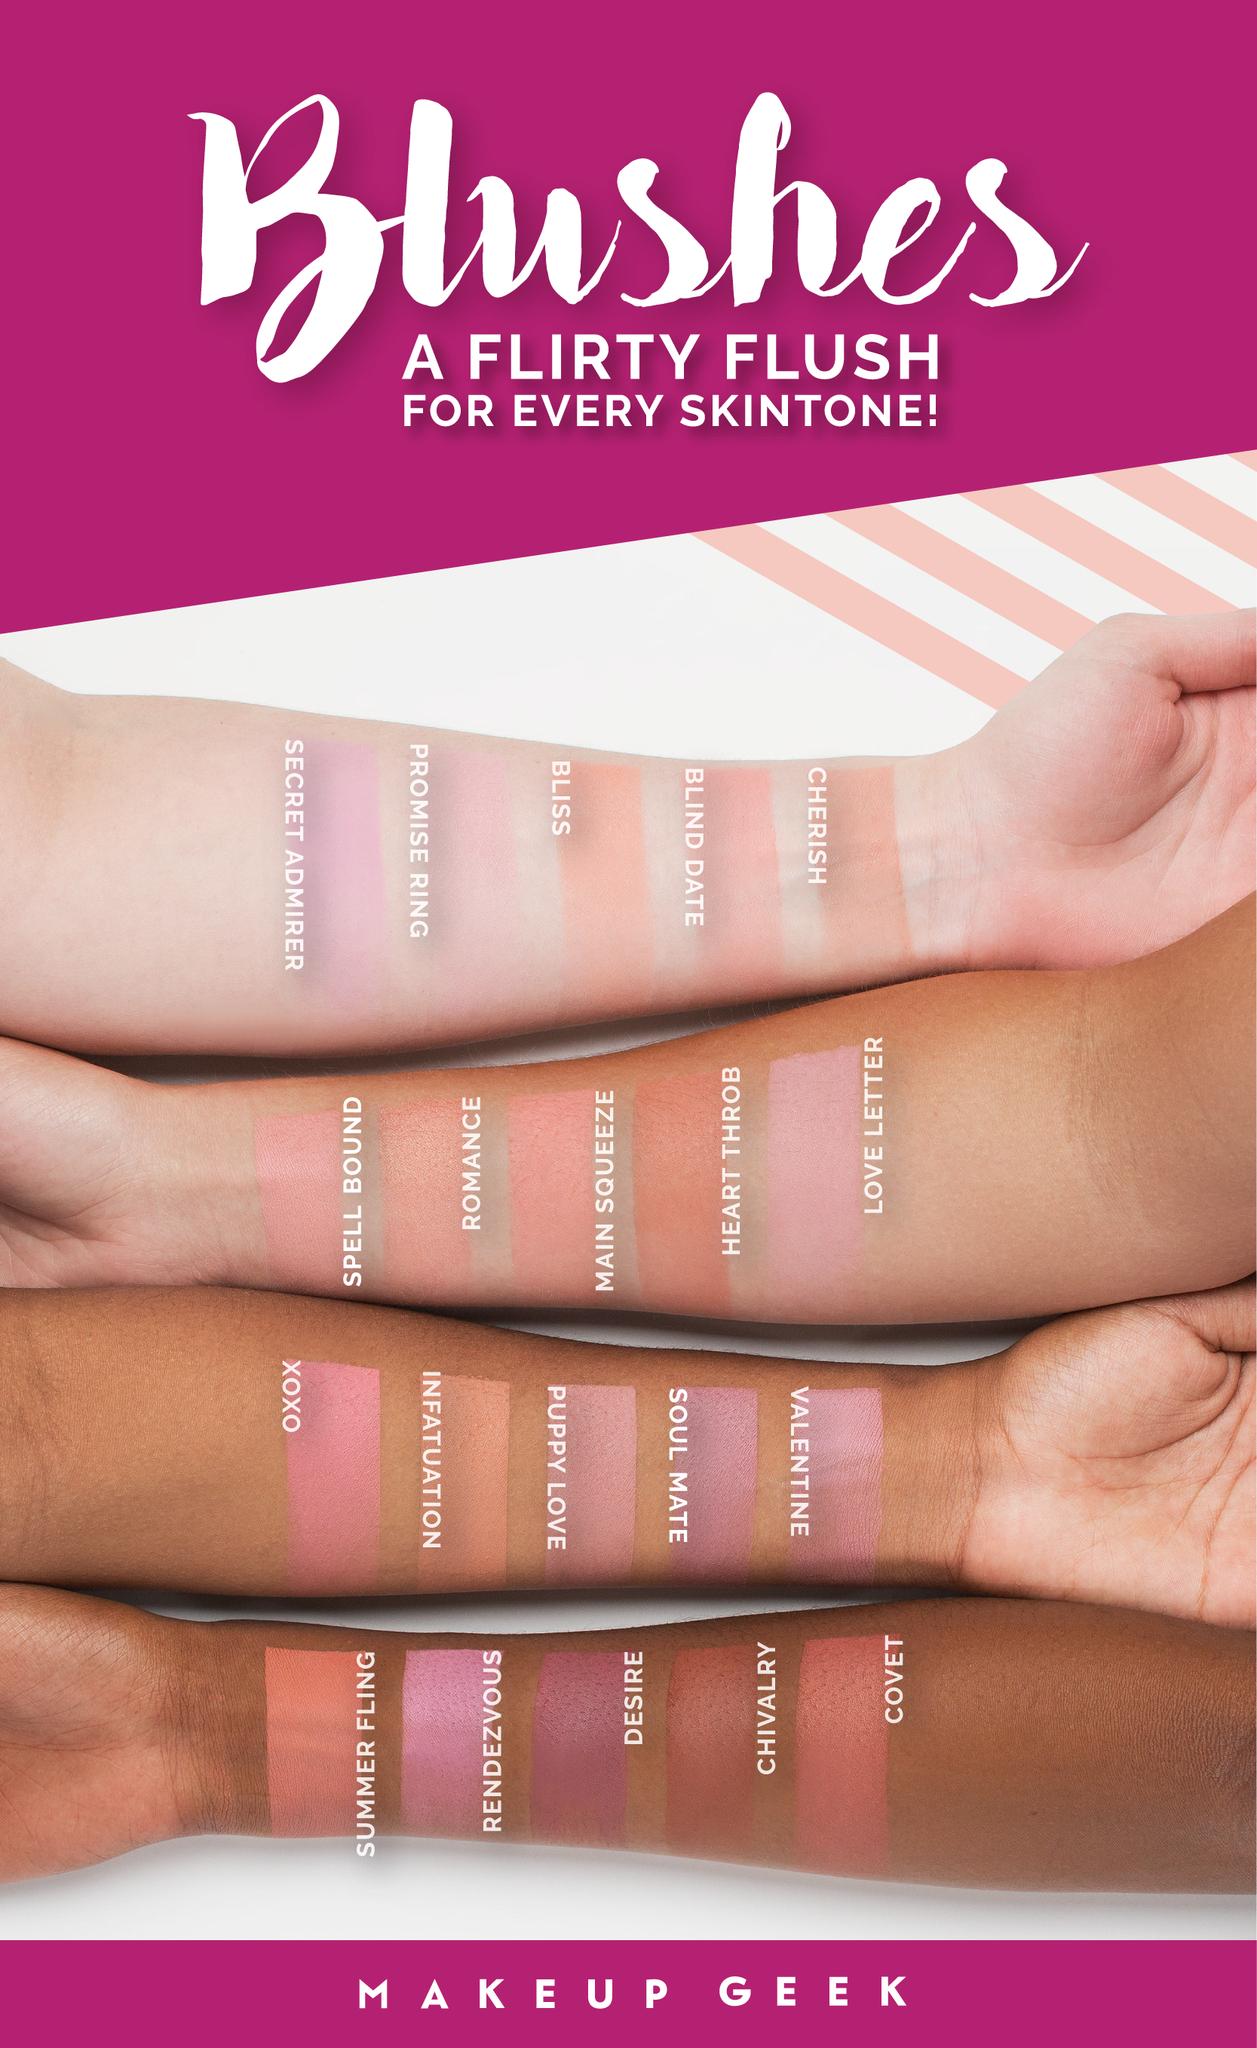 20 new and reformulated Makeup Geek Blushes! #makeupgeek